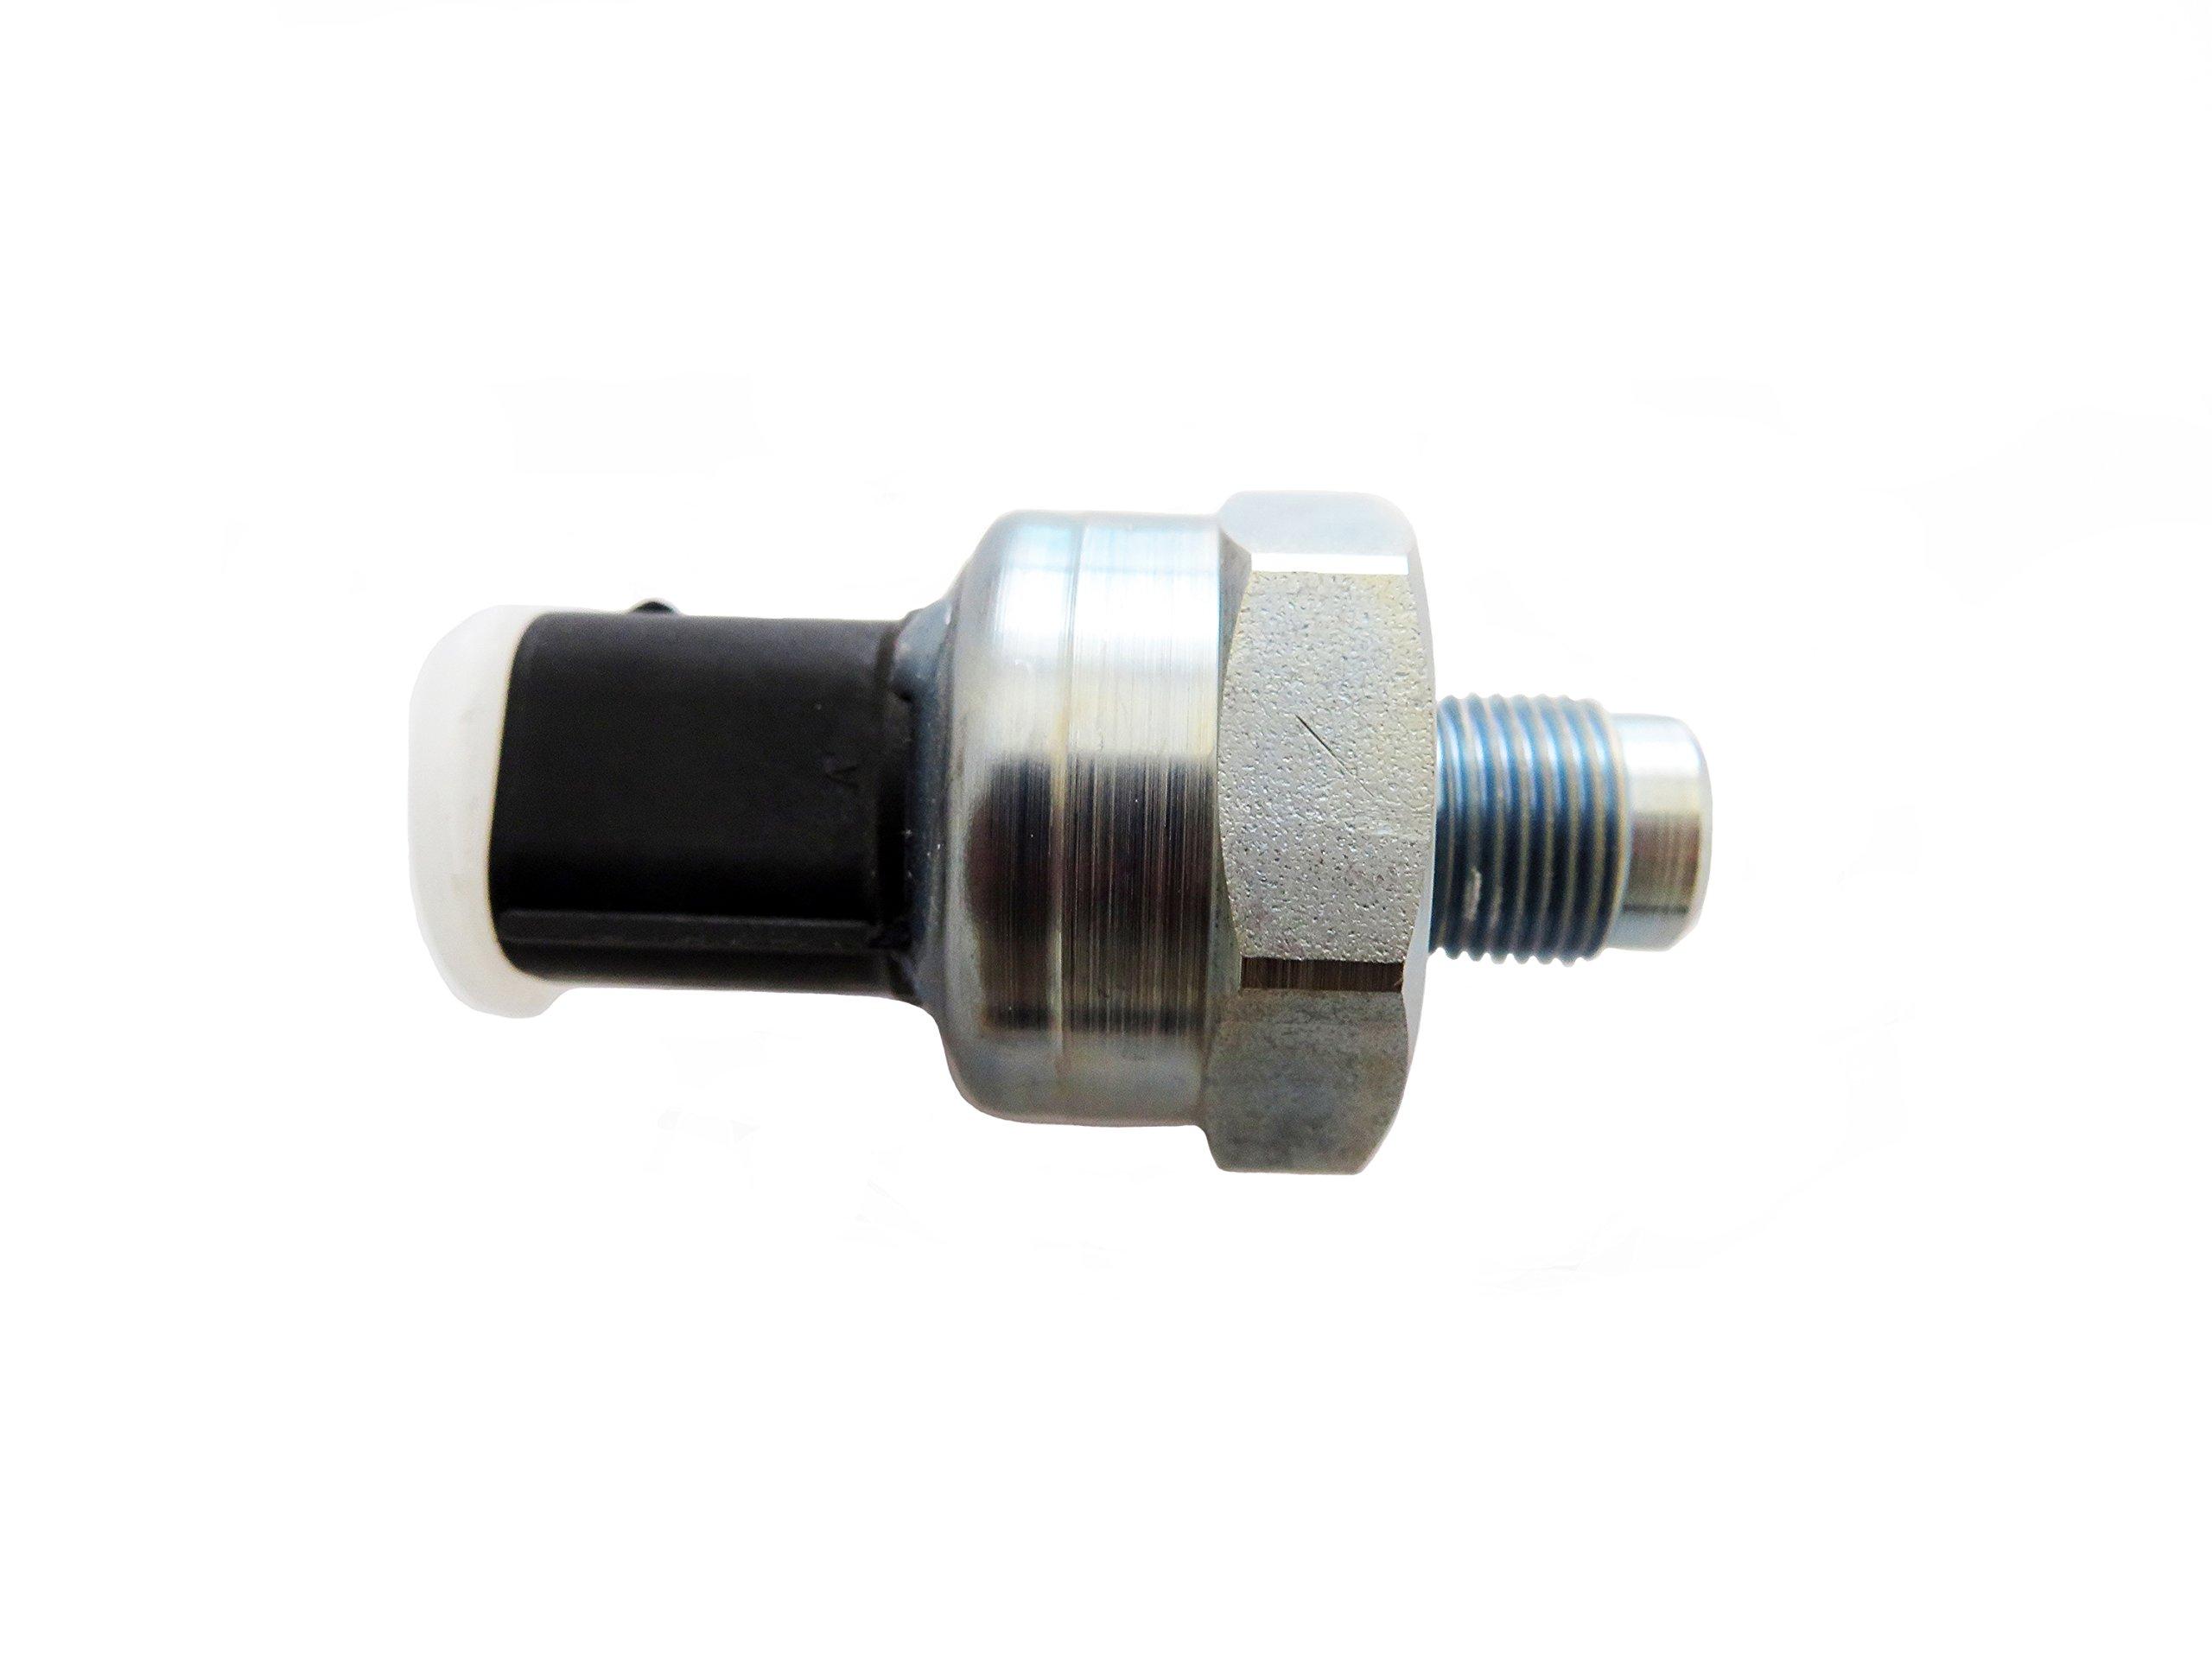 New Anti-lock Brake Pressure Sensor For 01-06 325Ci BMW 34521164458